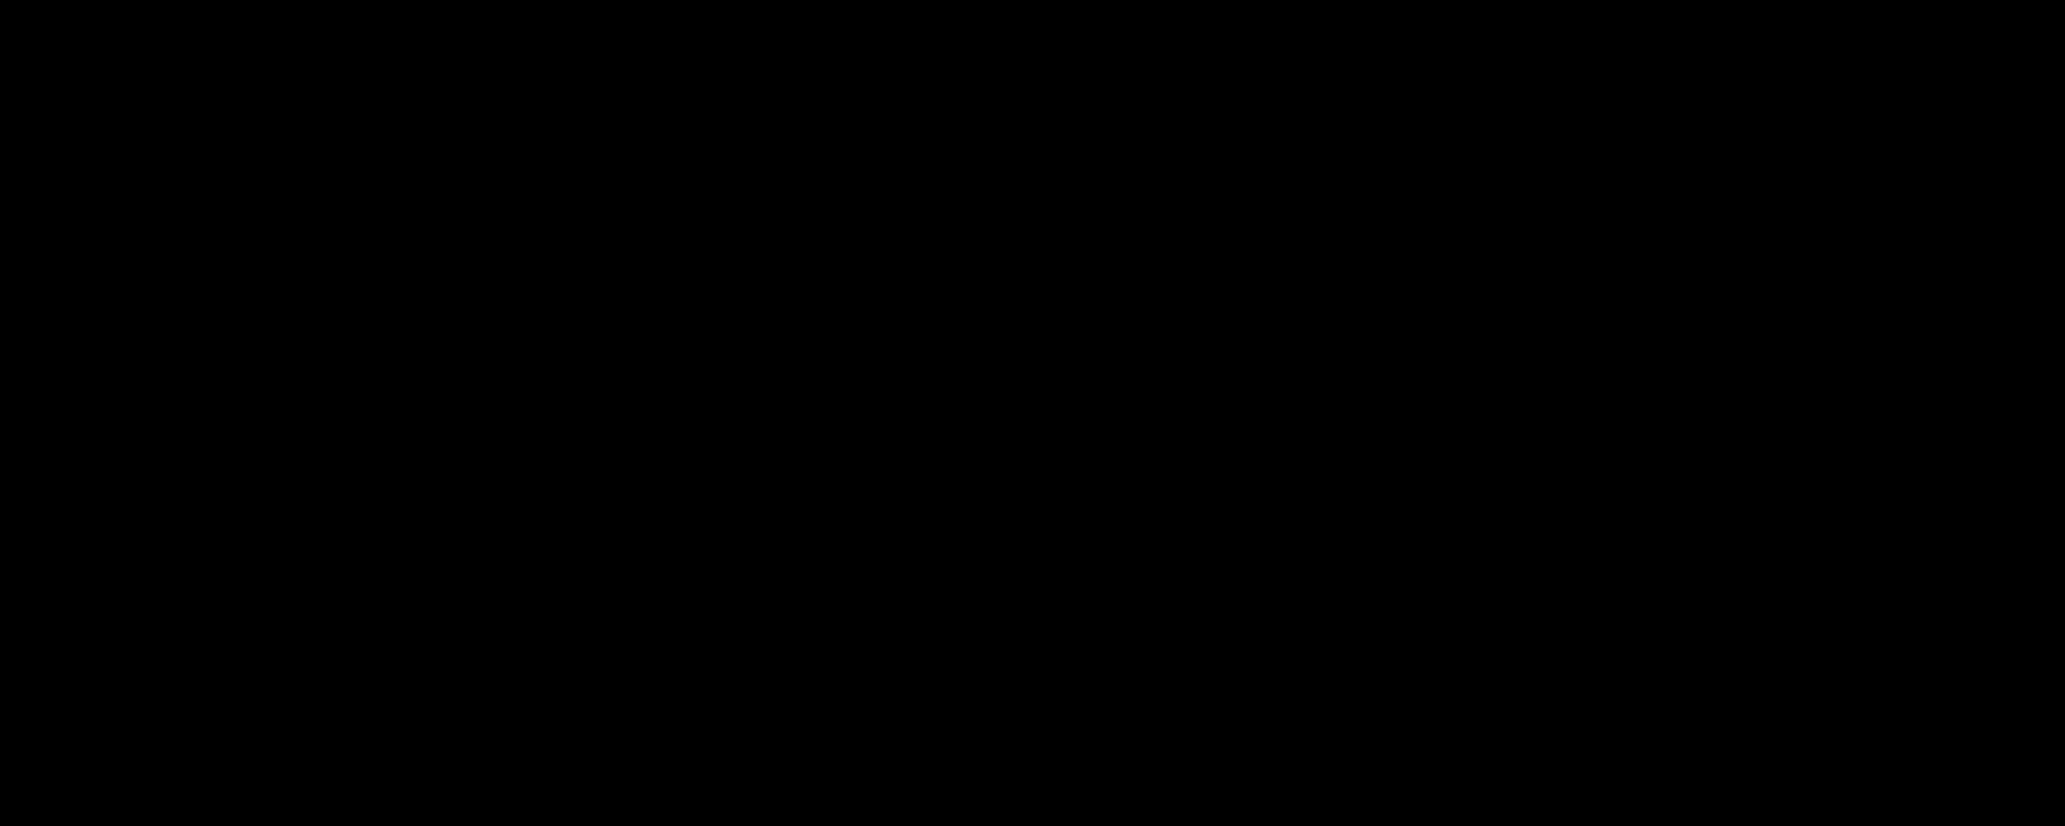 TetRad Mod